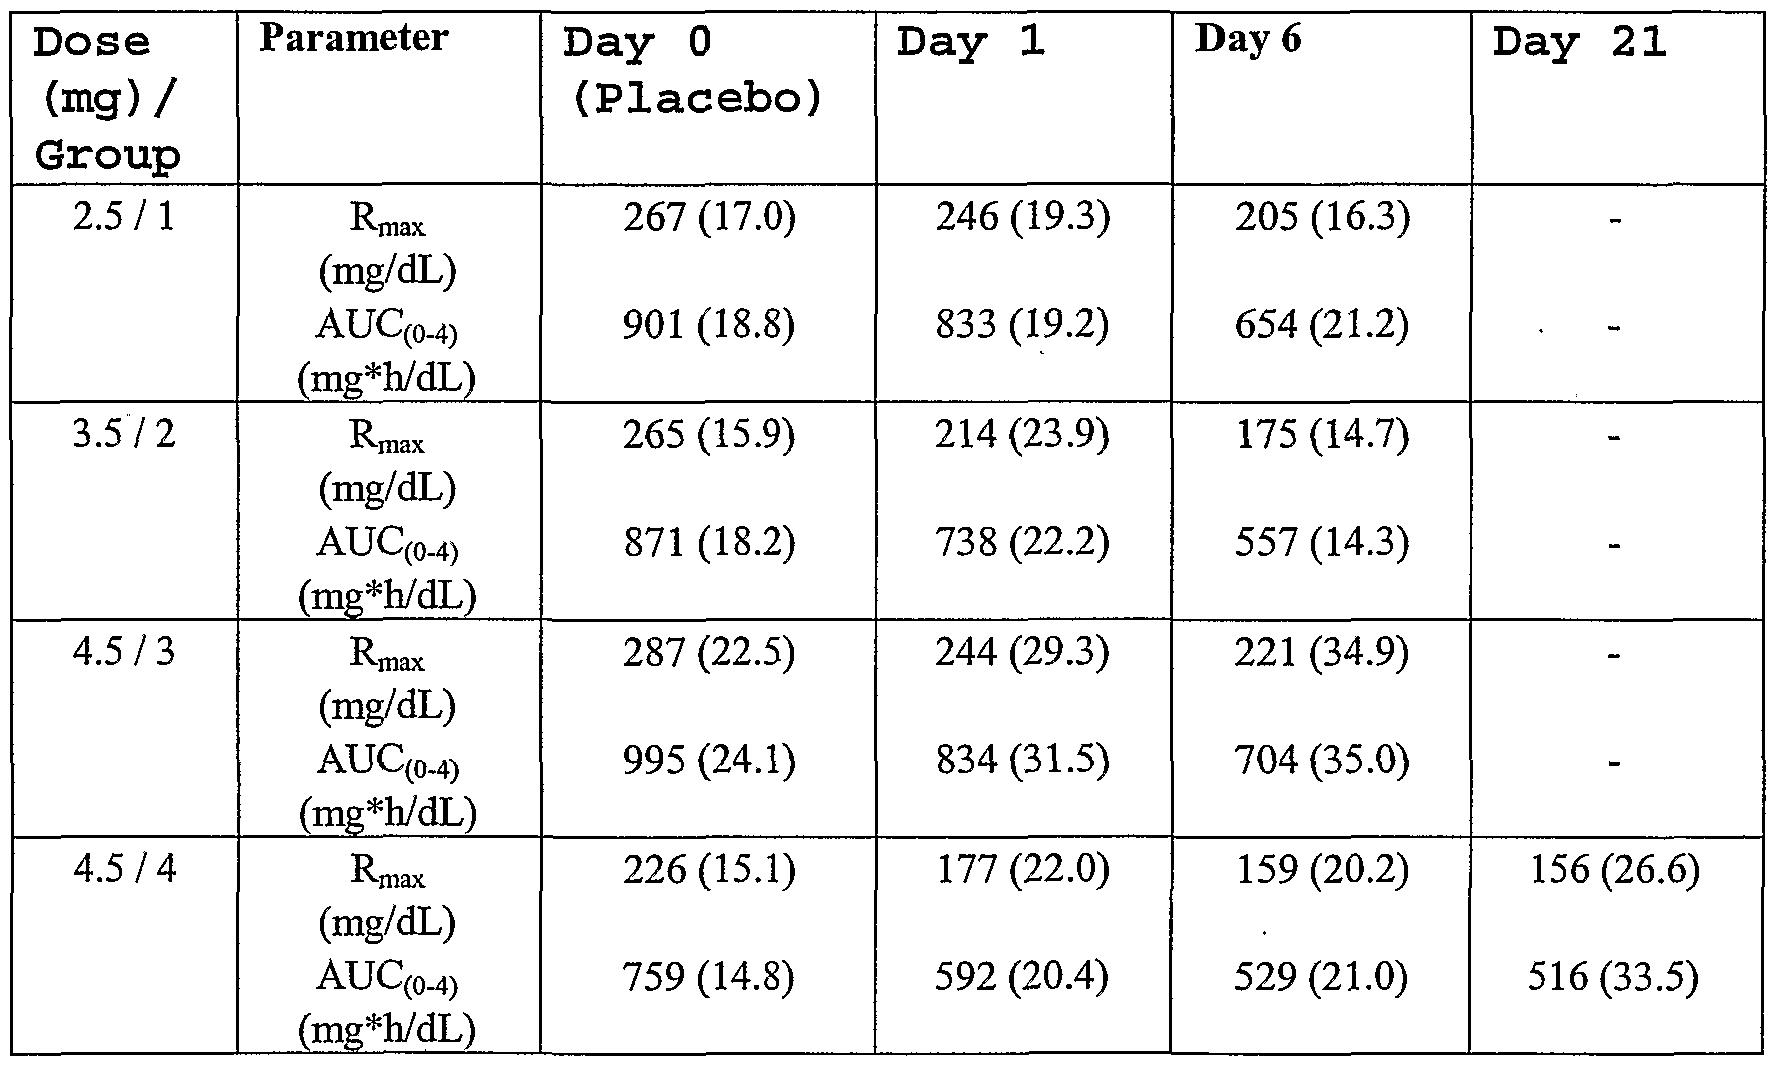 WO2002047716A2 - Chronic treatment regimen using glucagon